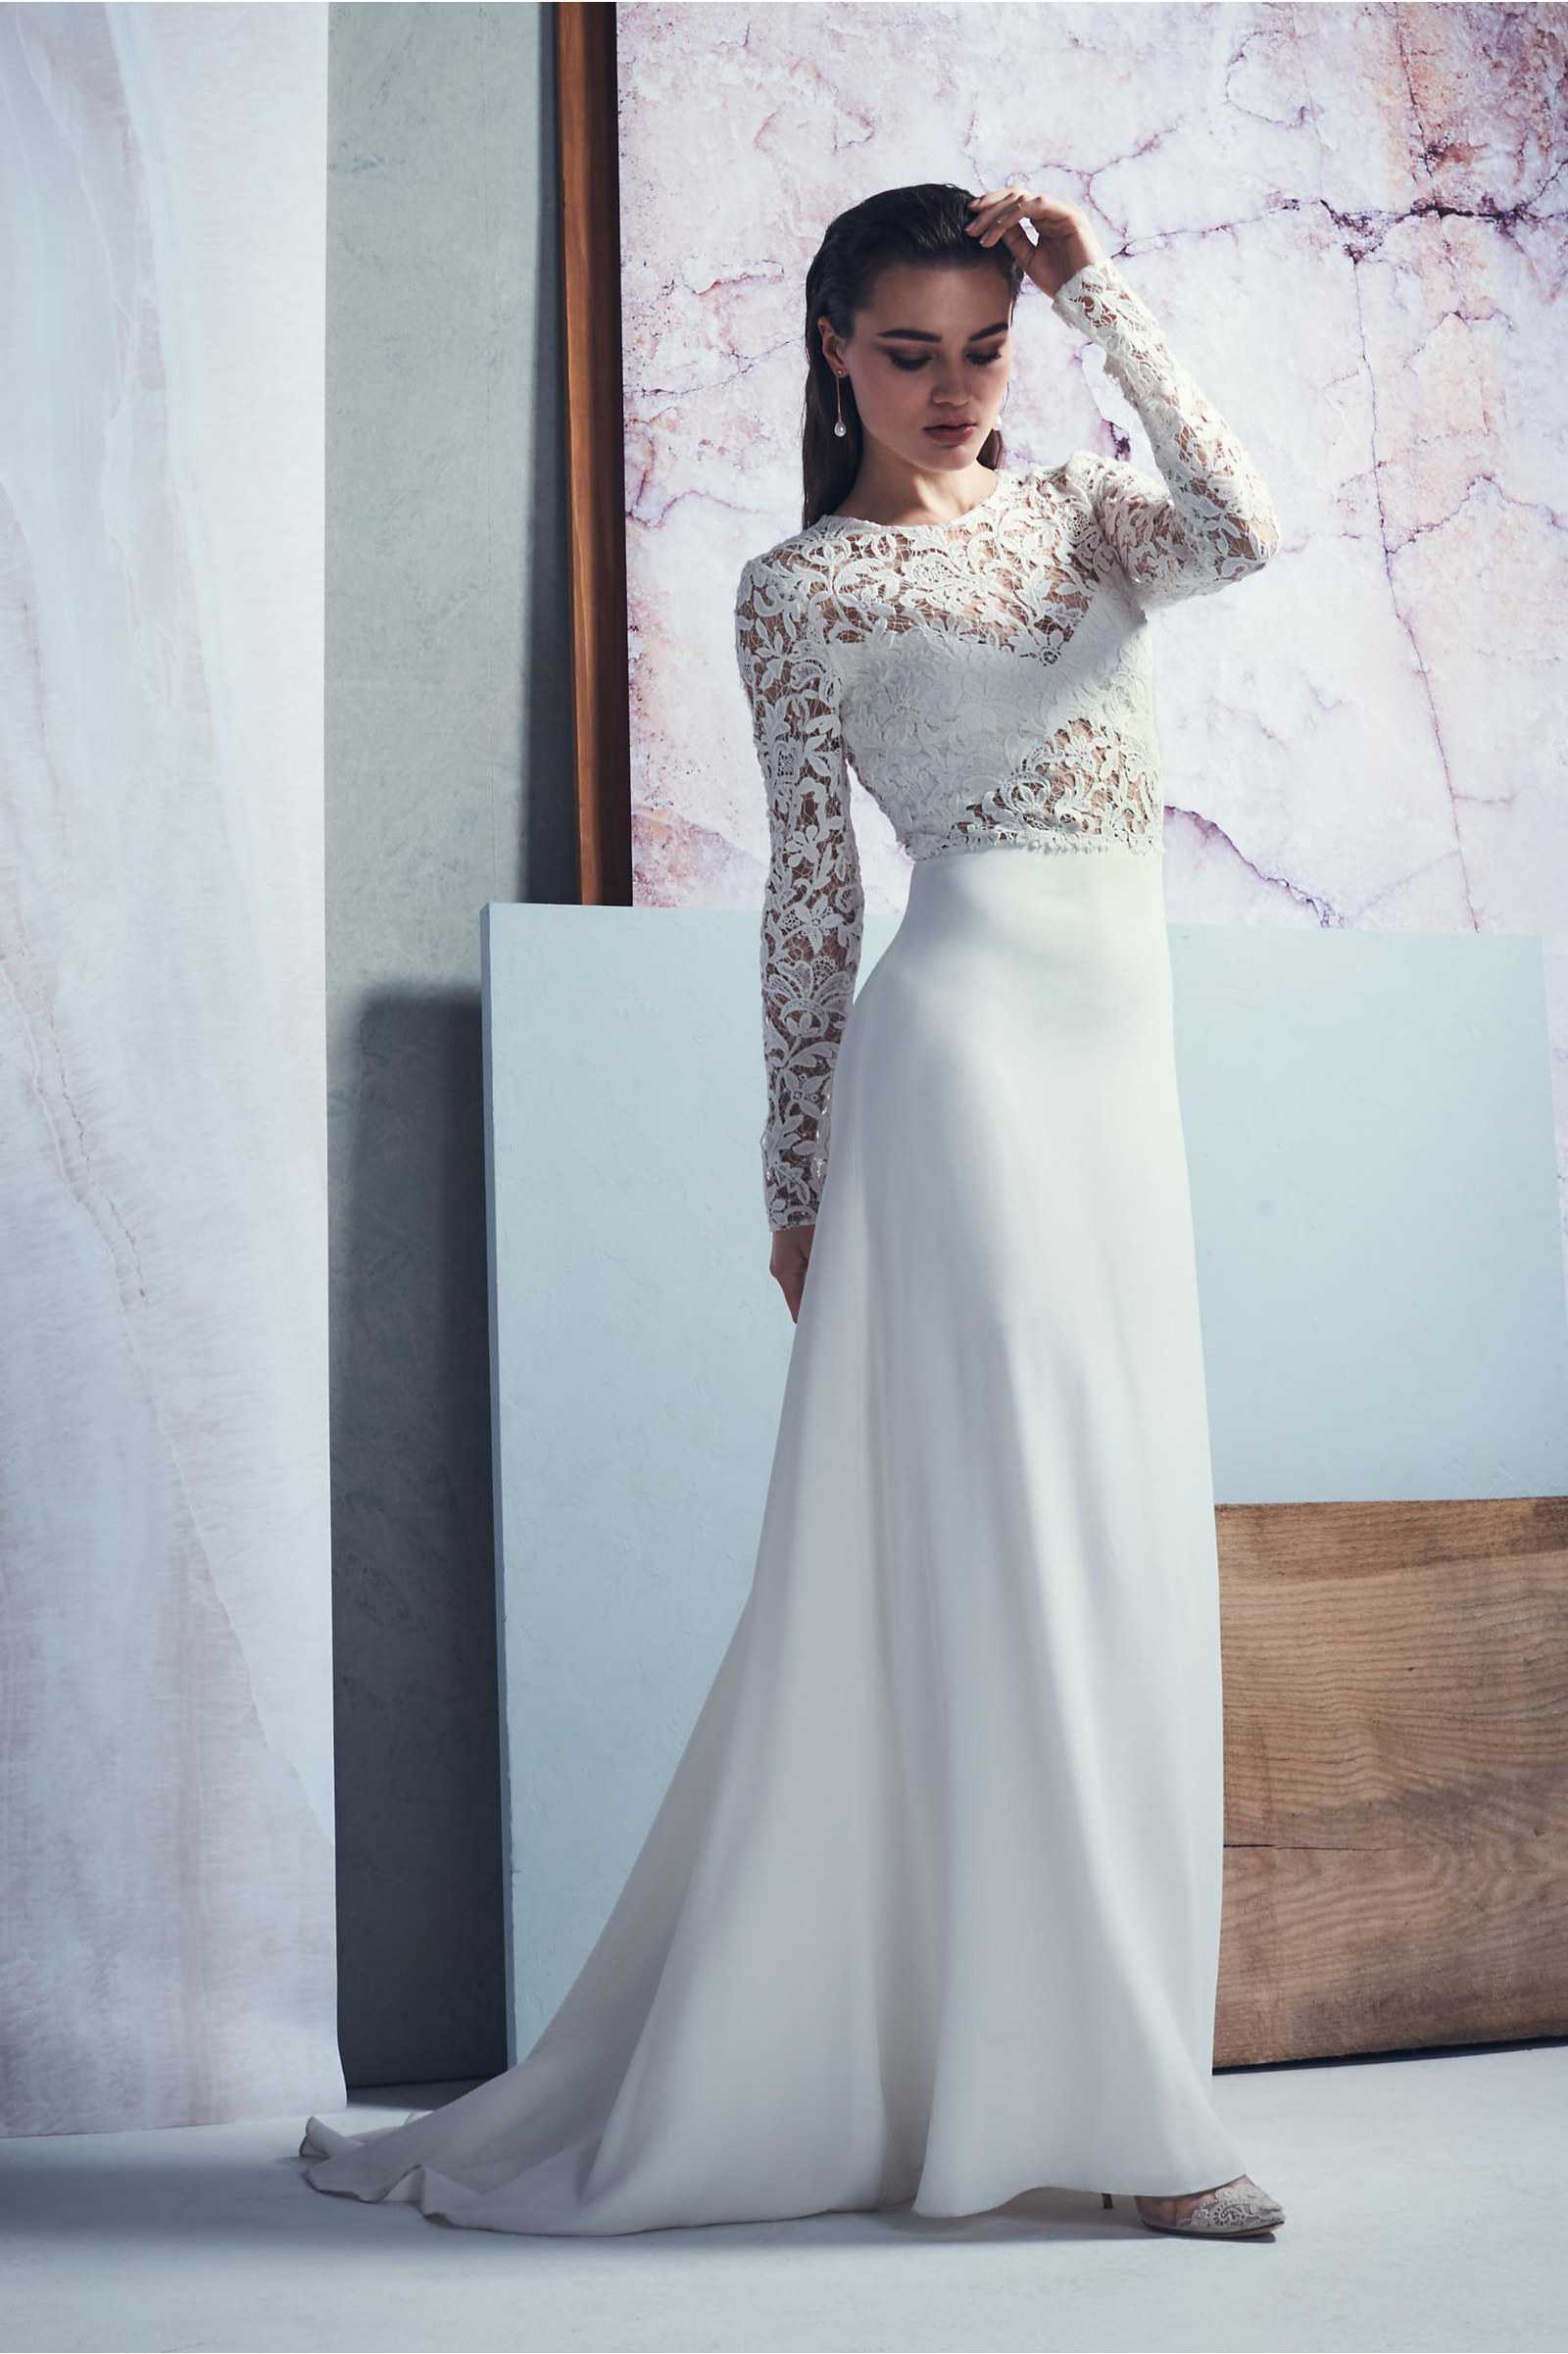 Generous Design Your Own Wedding Dress Online Gallery - Wedding ...